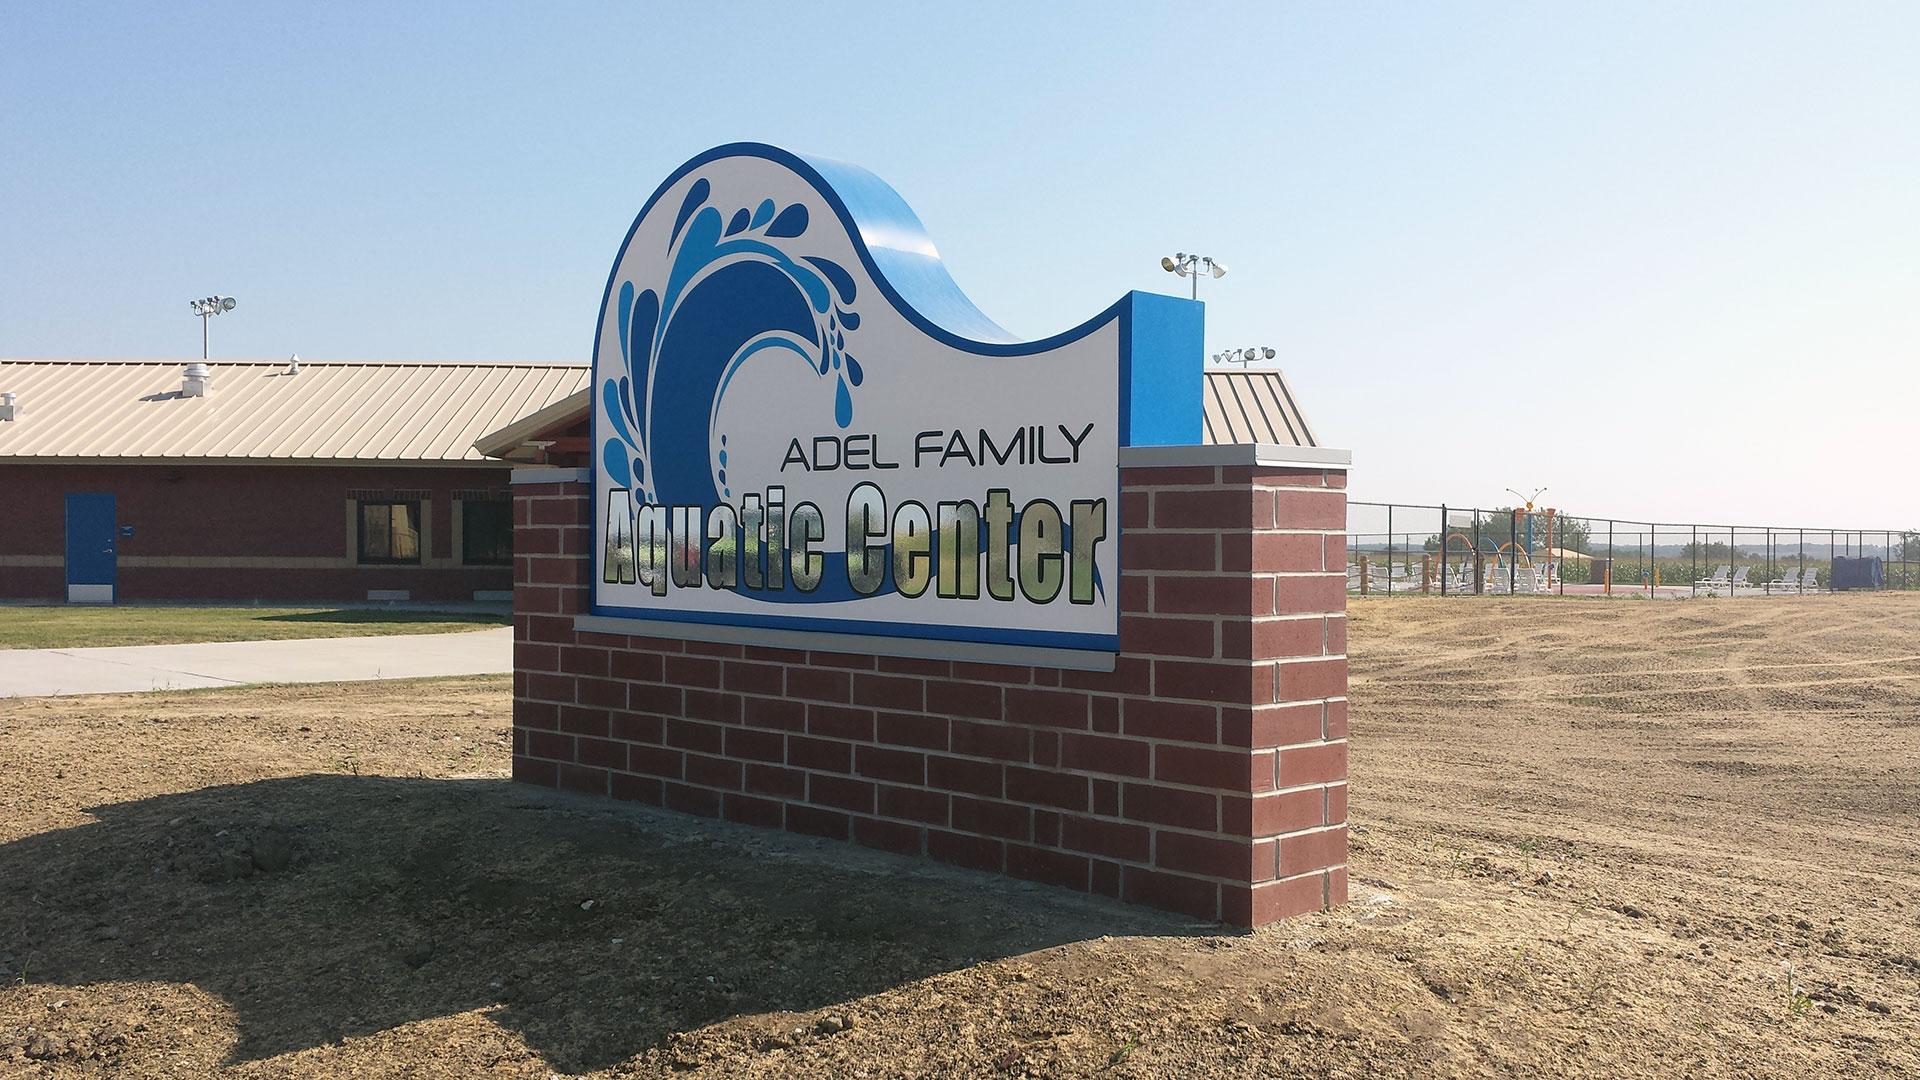 Adel Family Aquatic Center